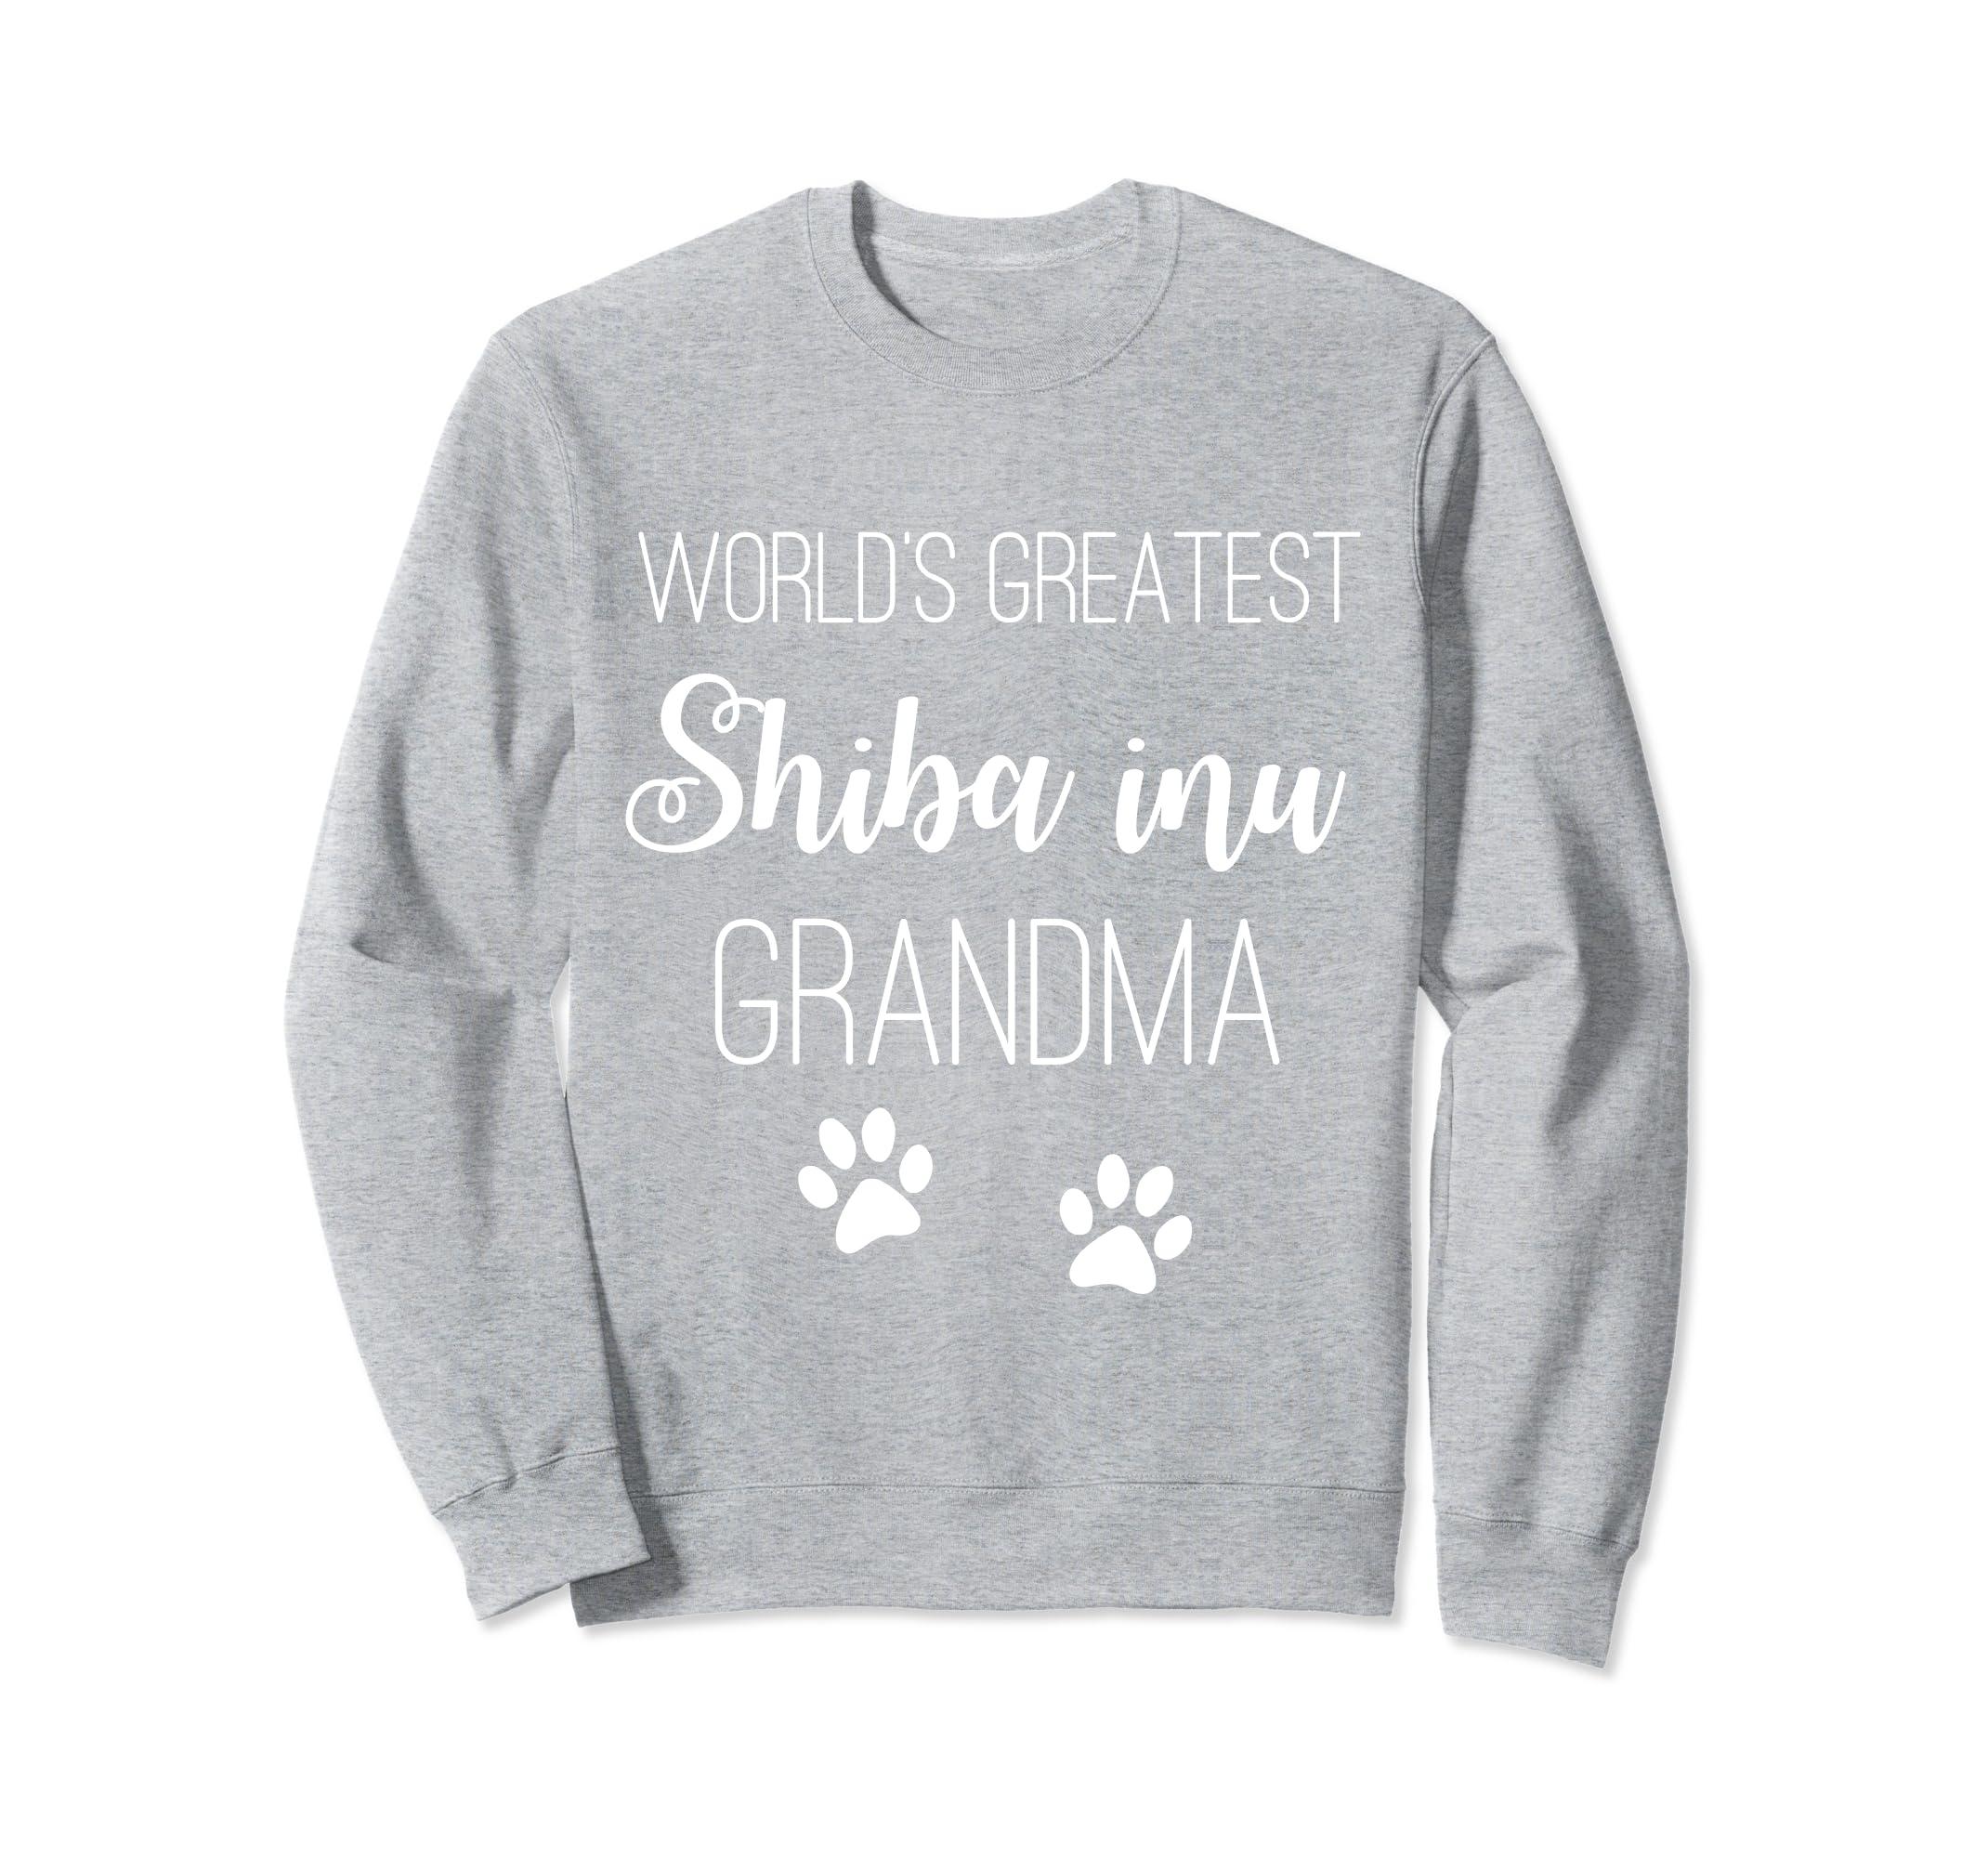 WORLDS GREATEST SHIBA INU GRANDMA SWEATSHIRT-SFL